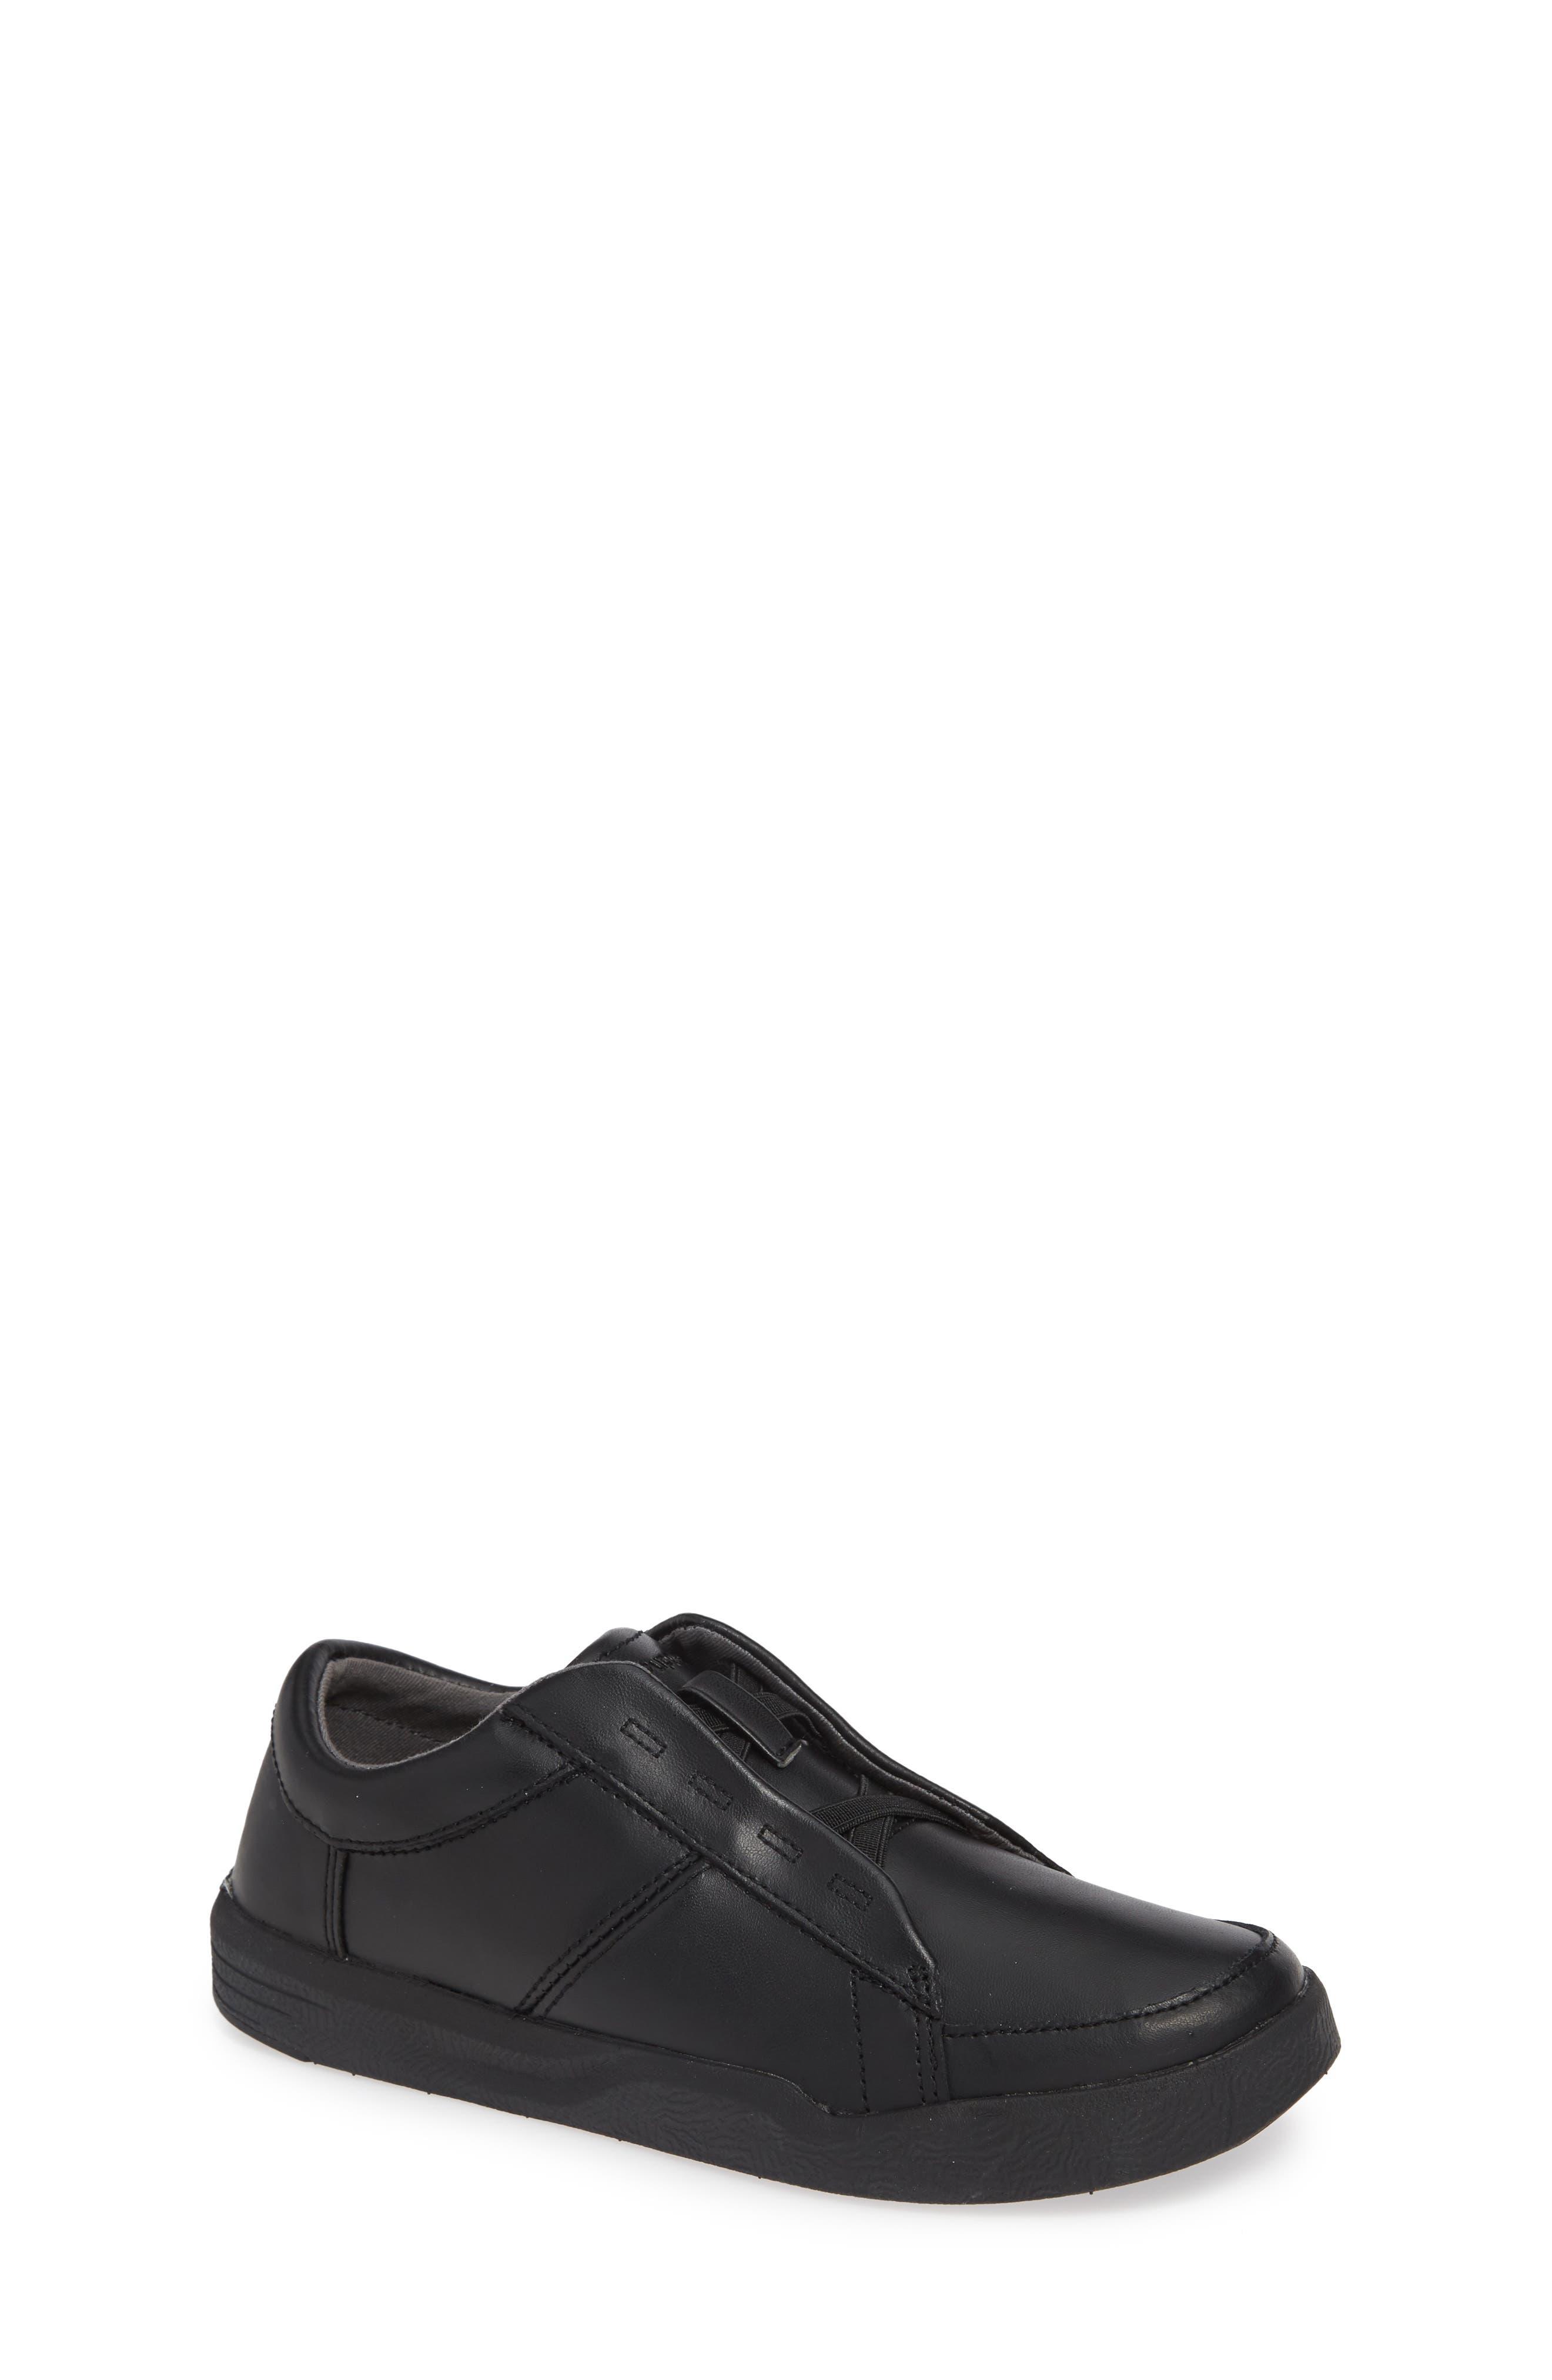 Layden Genius Leather Sneaker,                         Main,                         color, BLACK/ BLACK